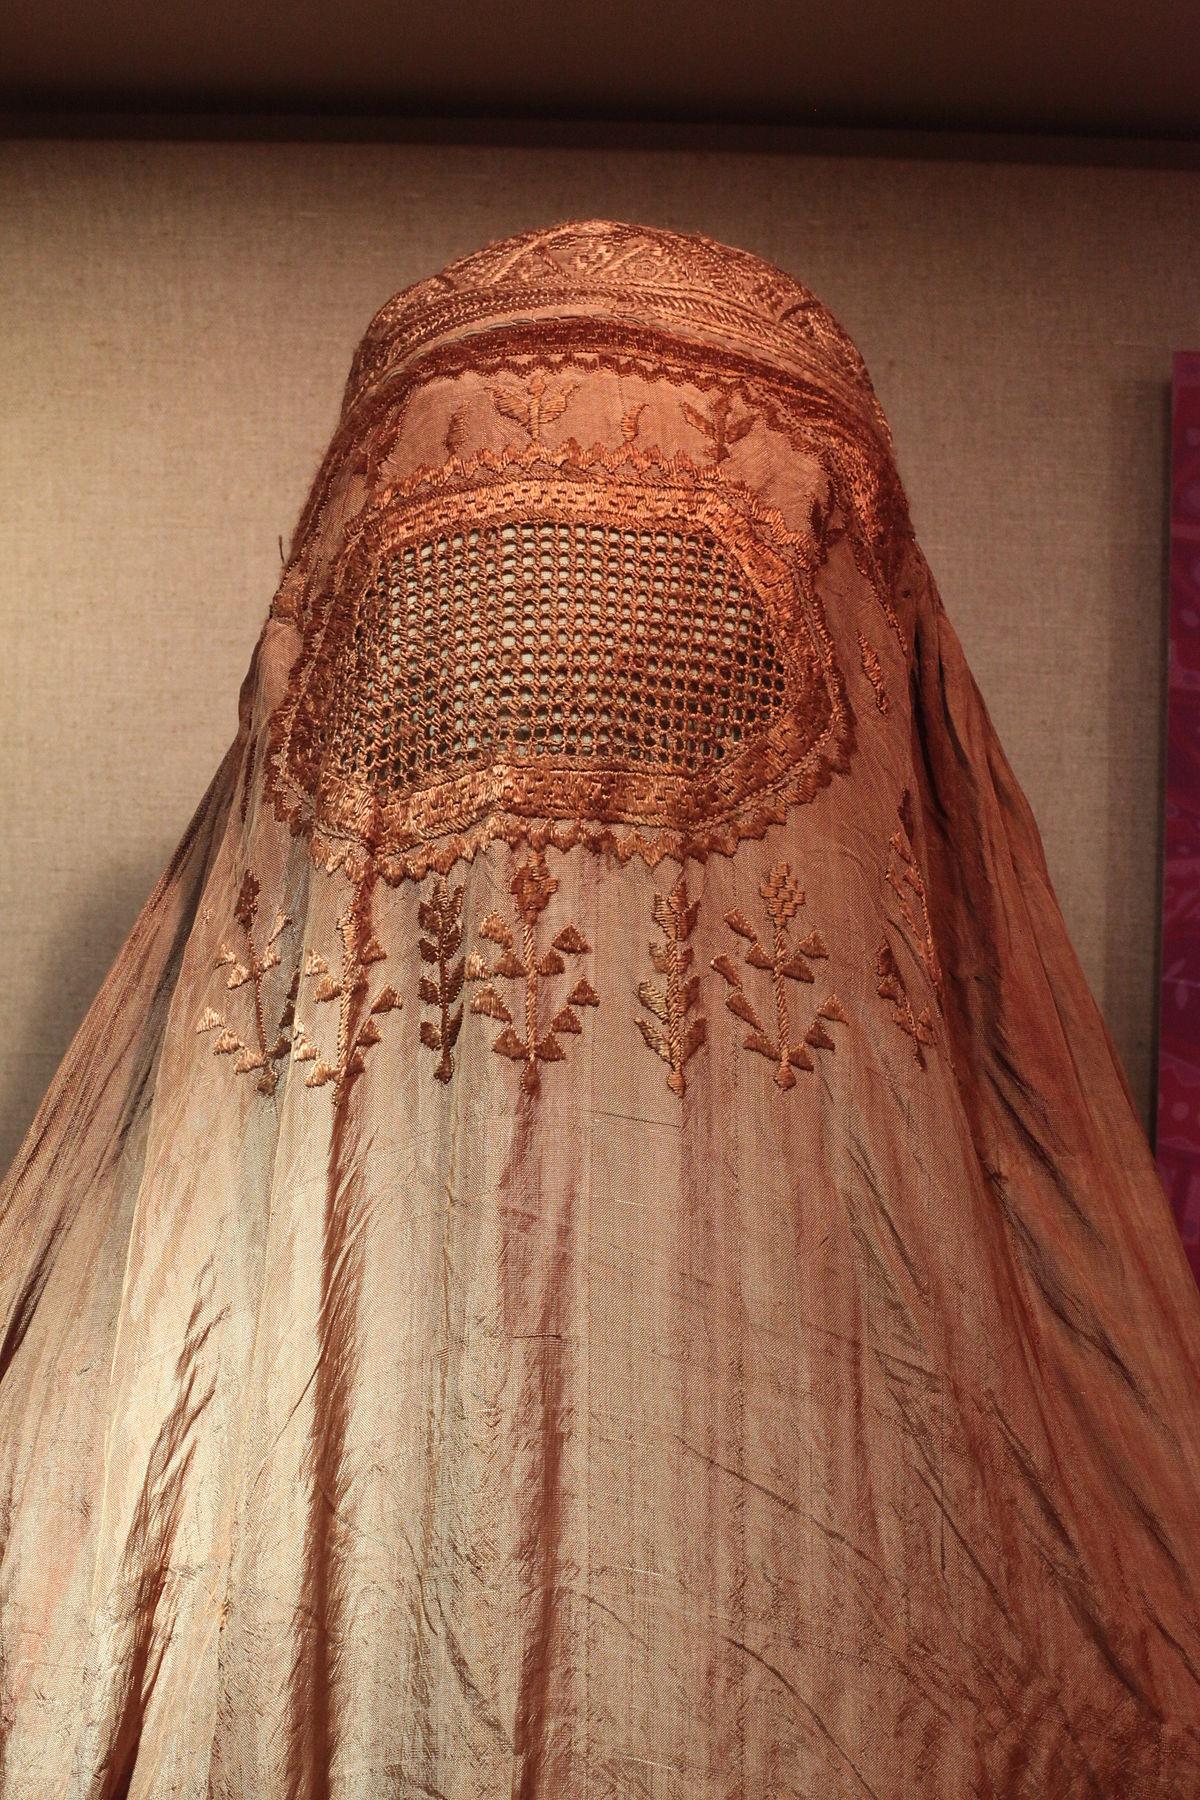 Burqa IMG 1127.jpg